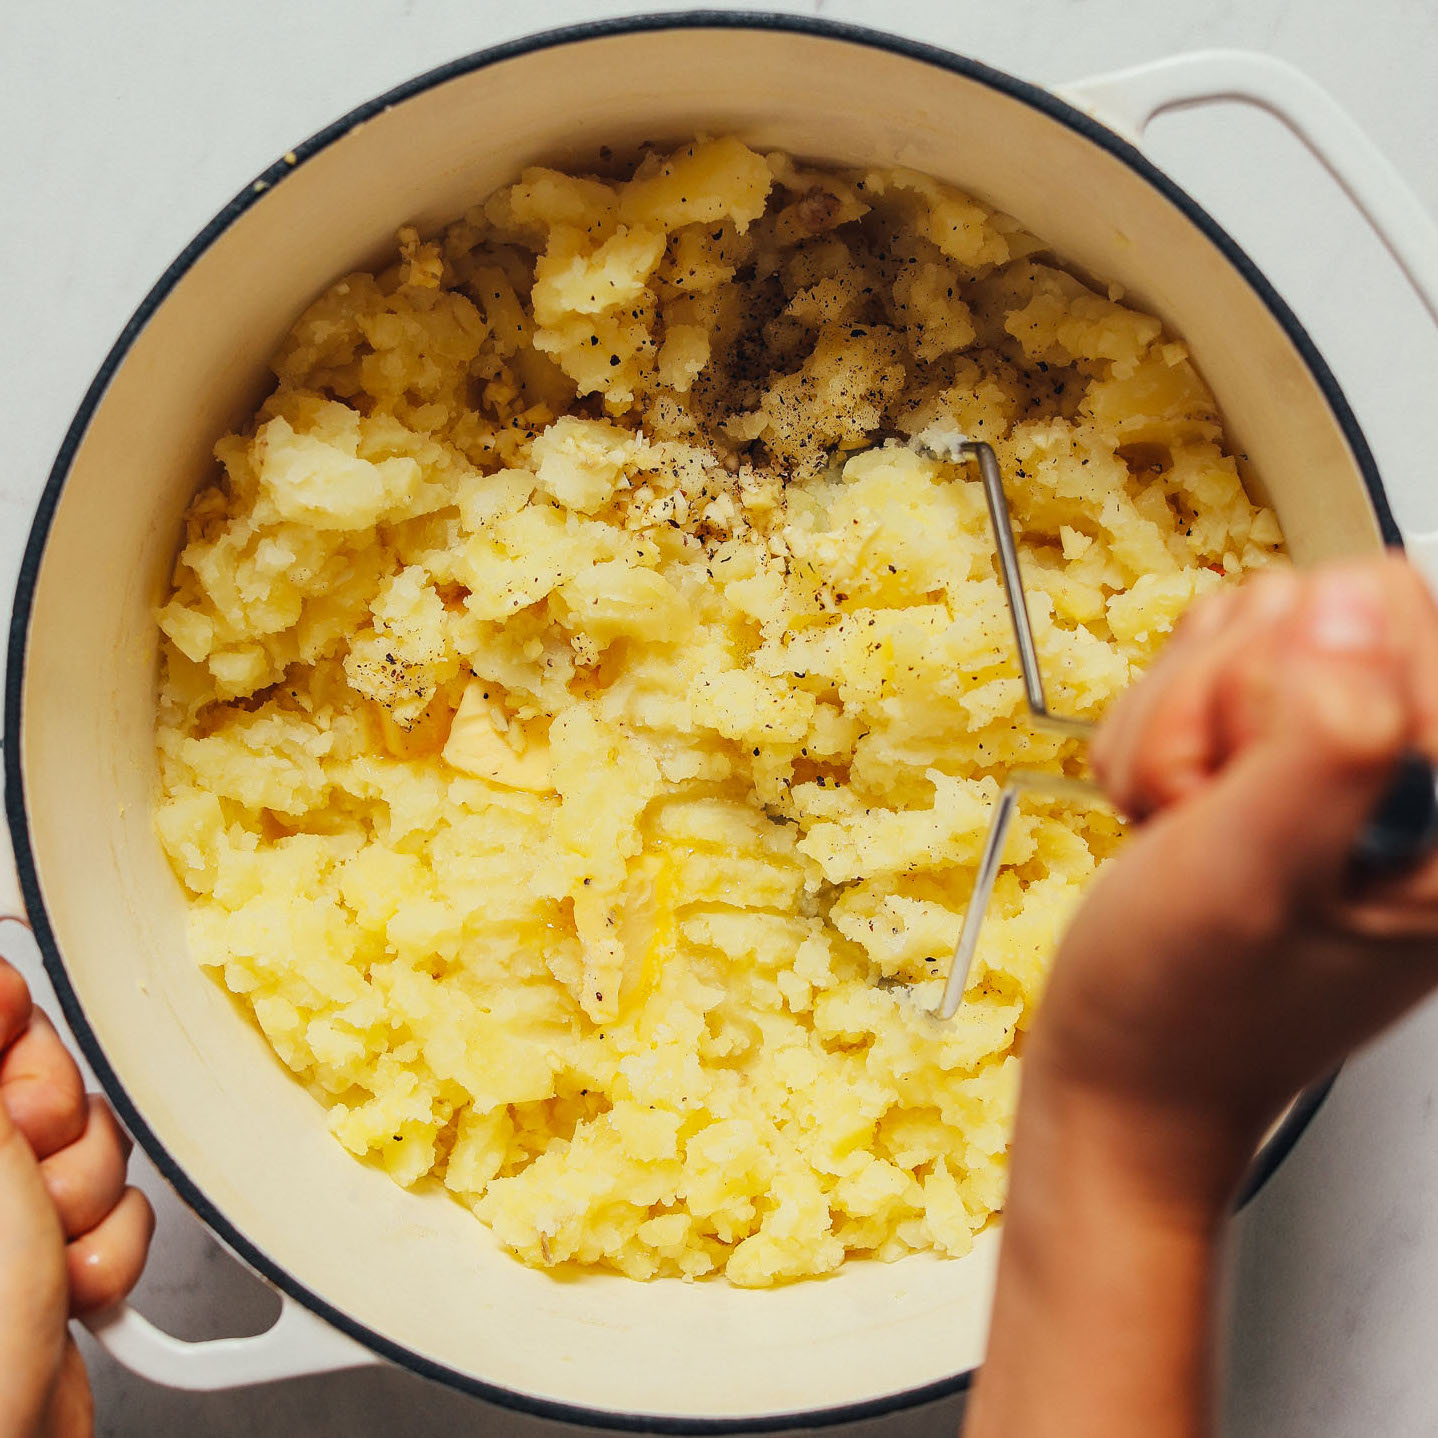 Using a potato masher to show How to Make Mashed Potatoes